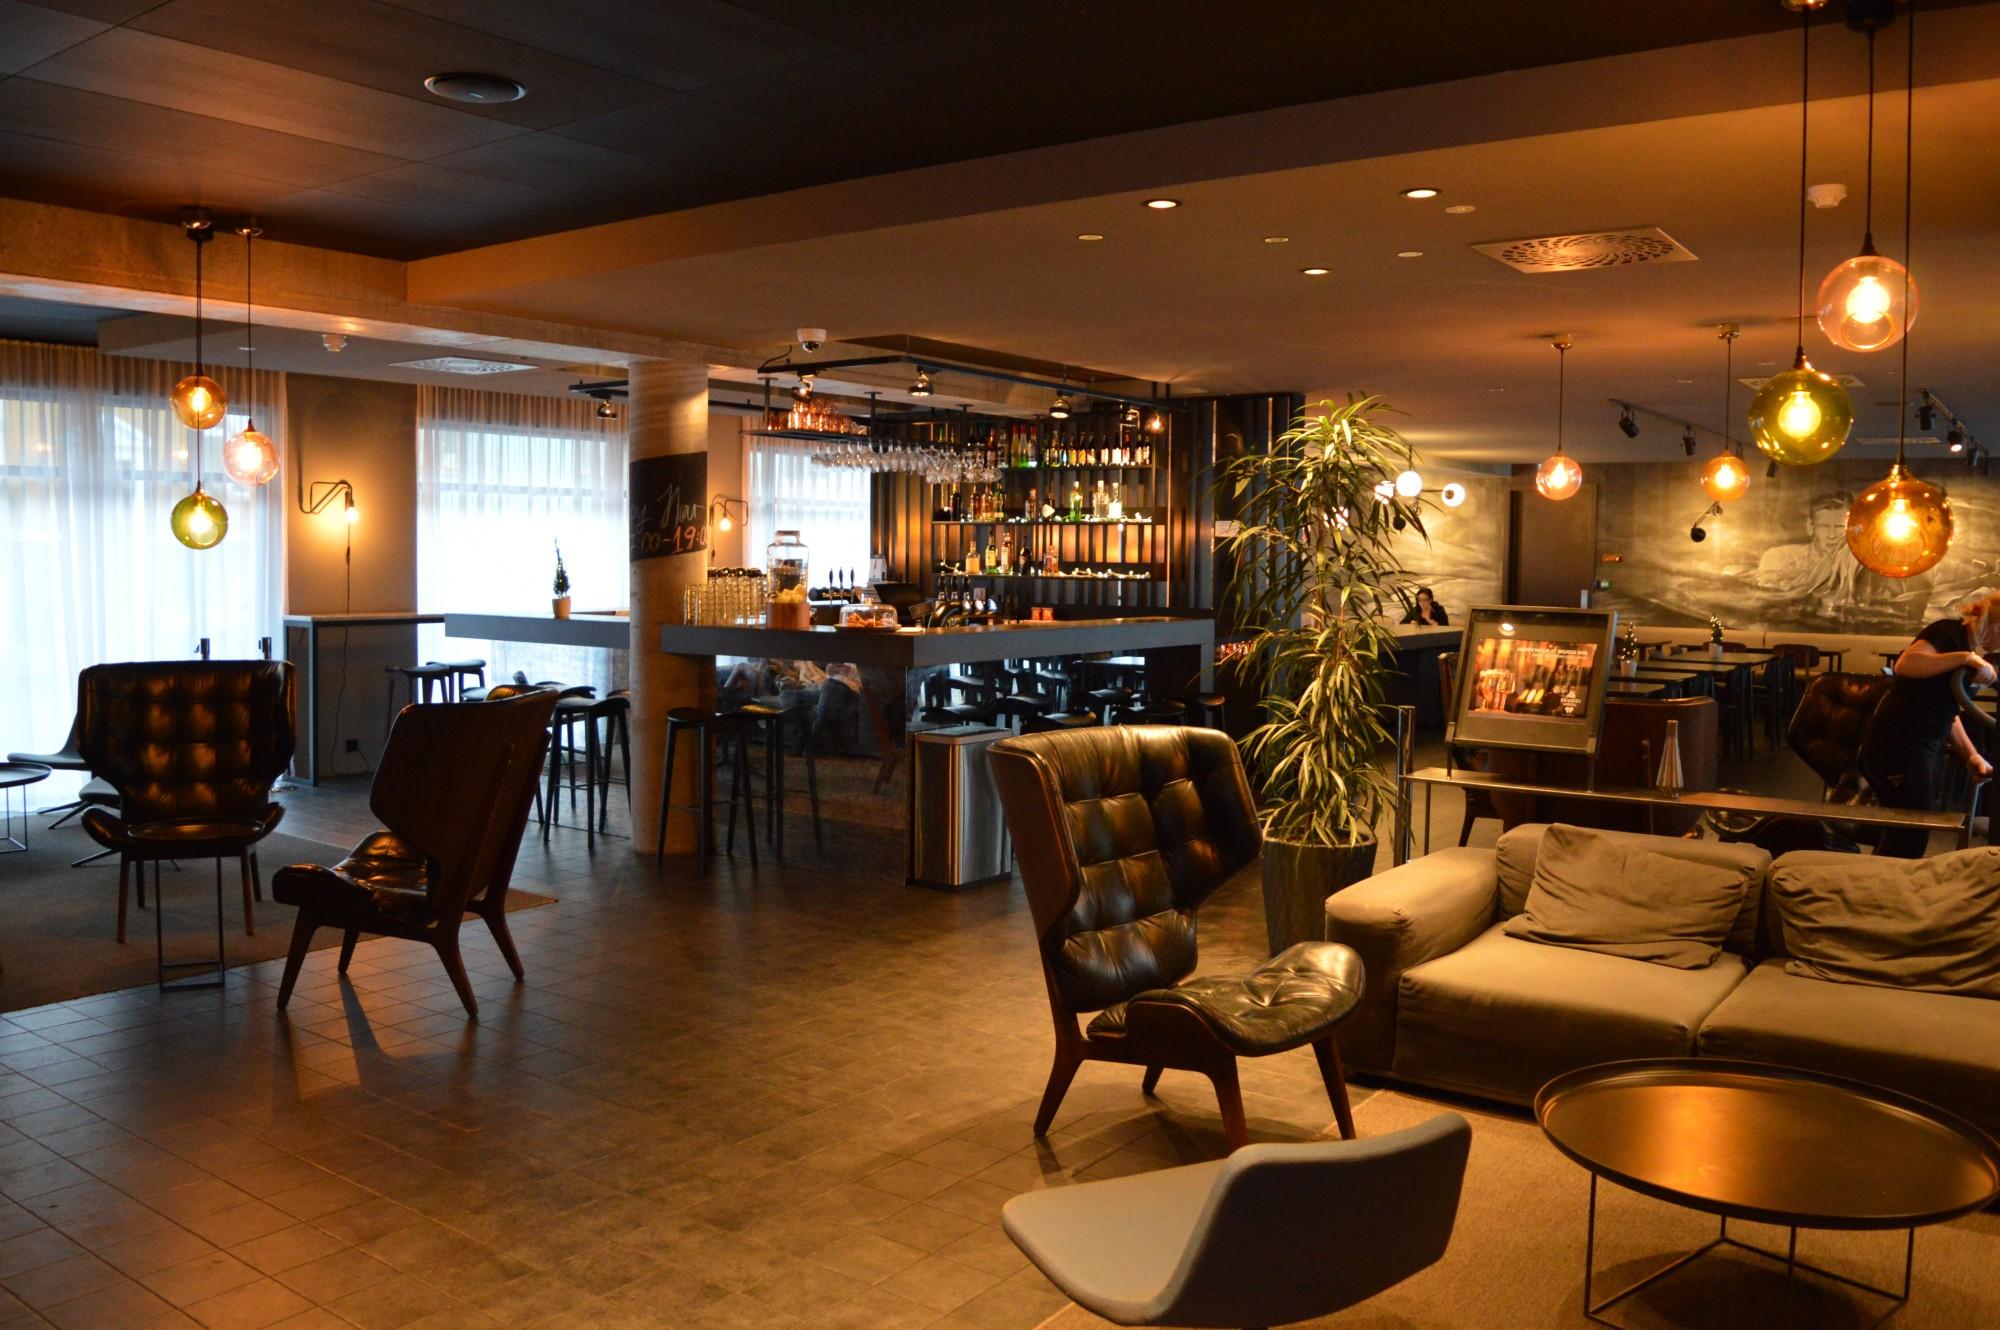 Skuggi hotel bar, Reykjavik